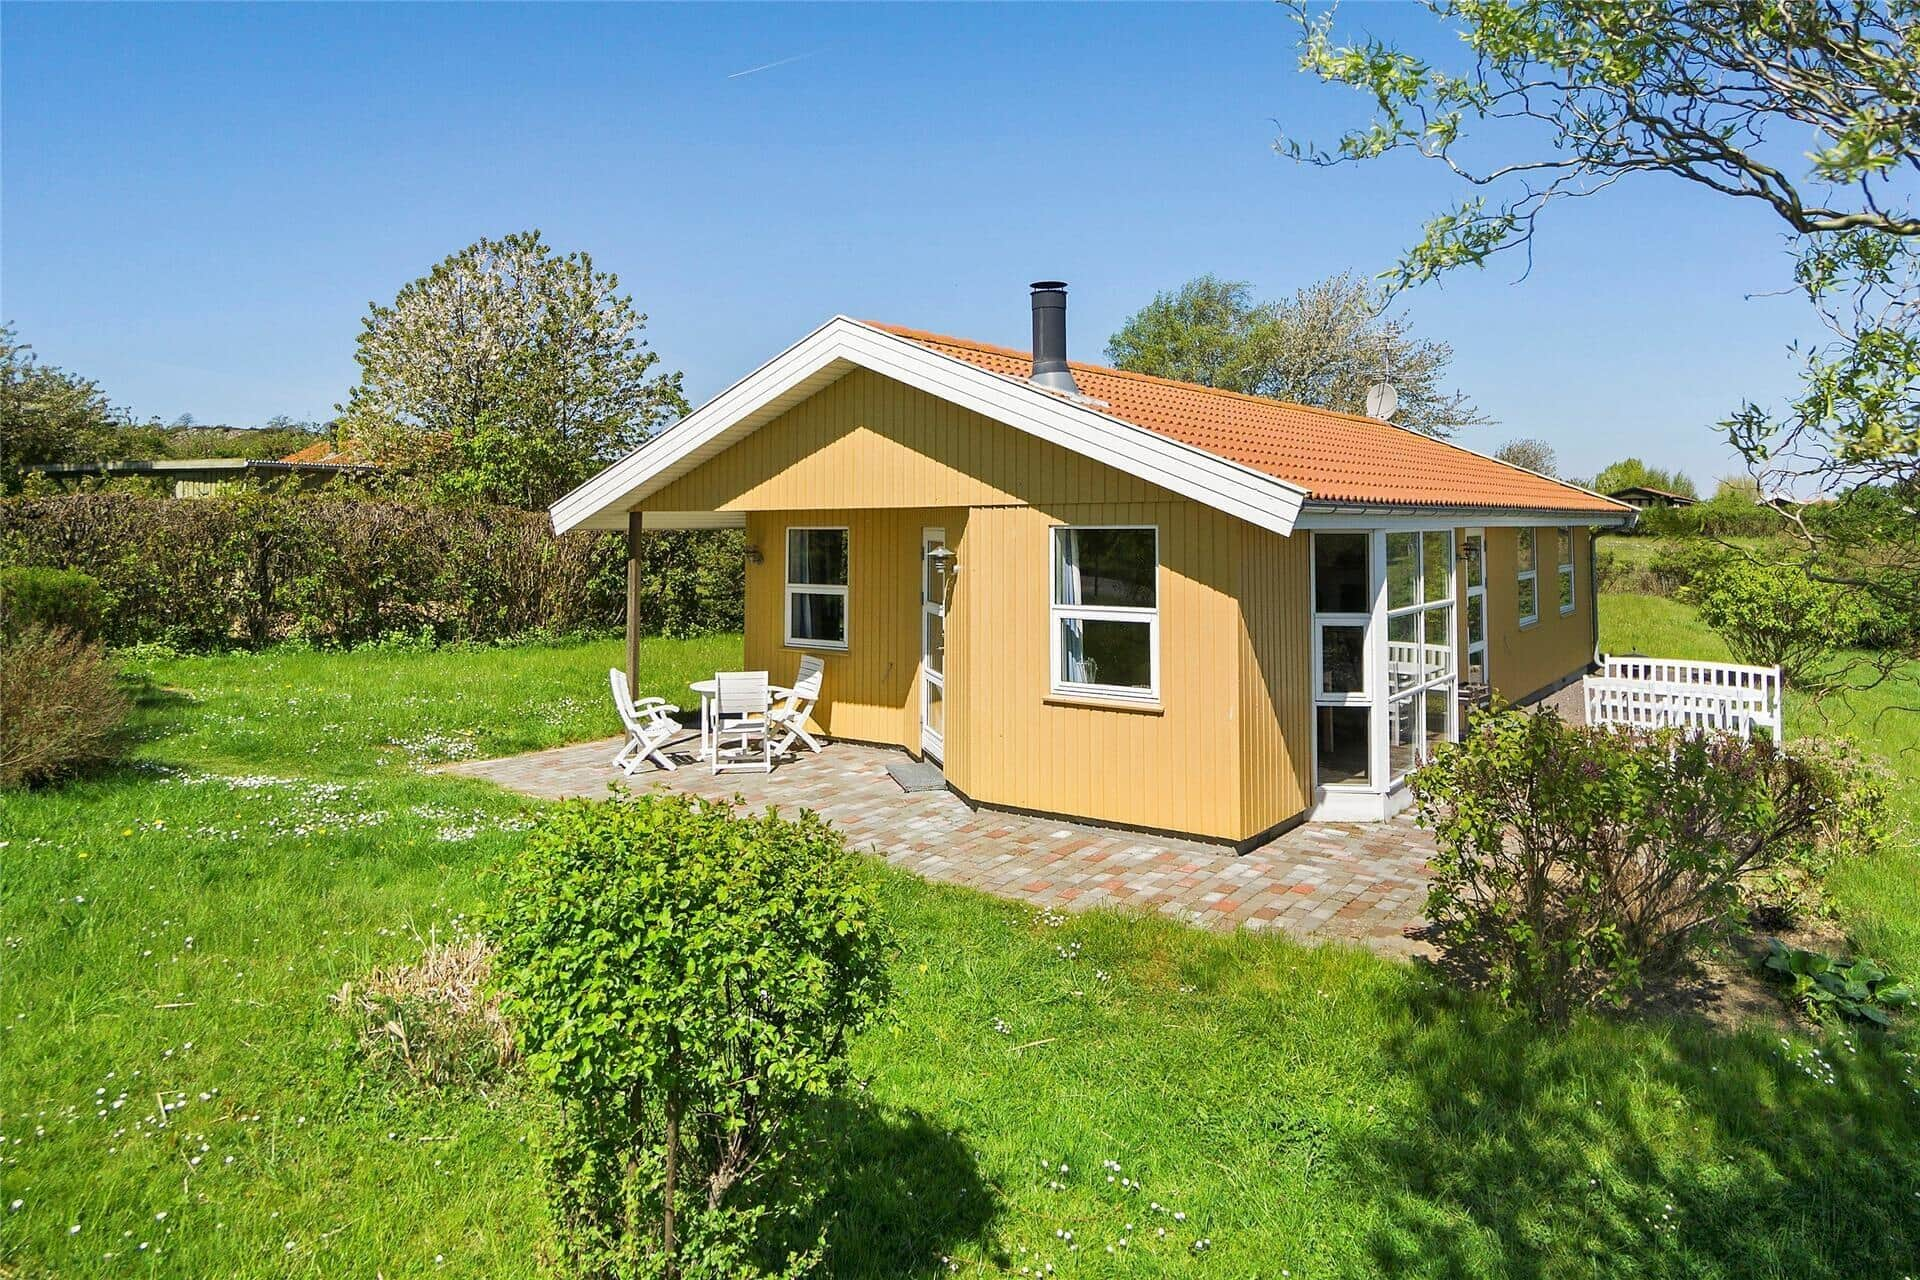 Image 1-10 Holiday-home 6775, Stakkebakken 1, DK - 3770 Allinge